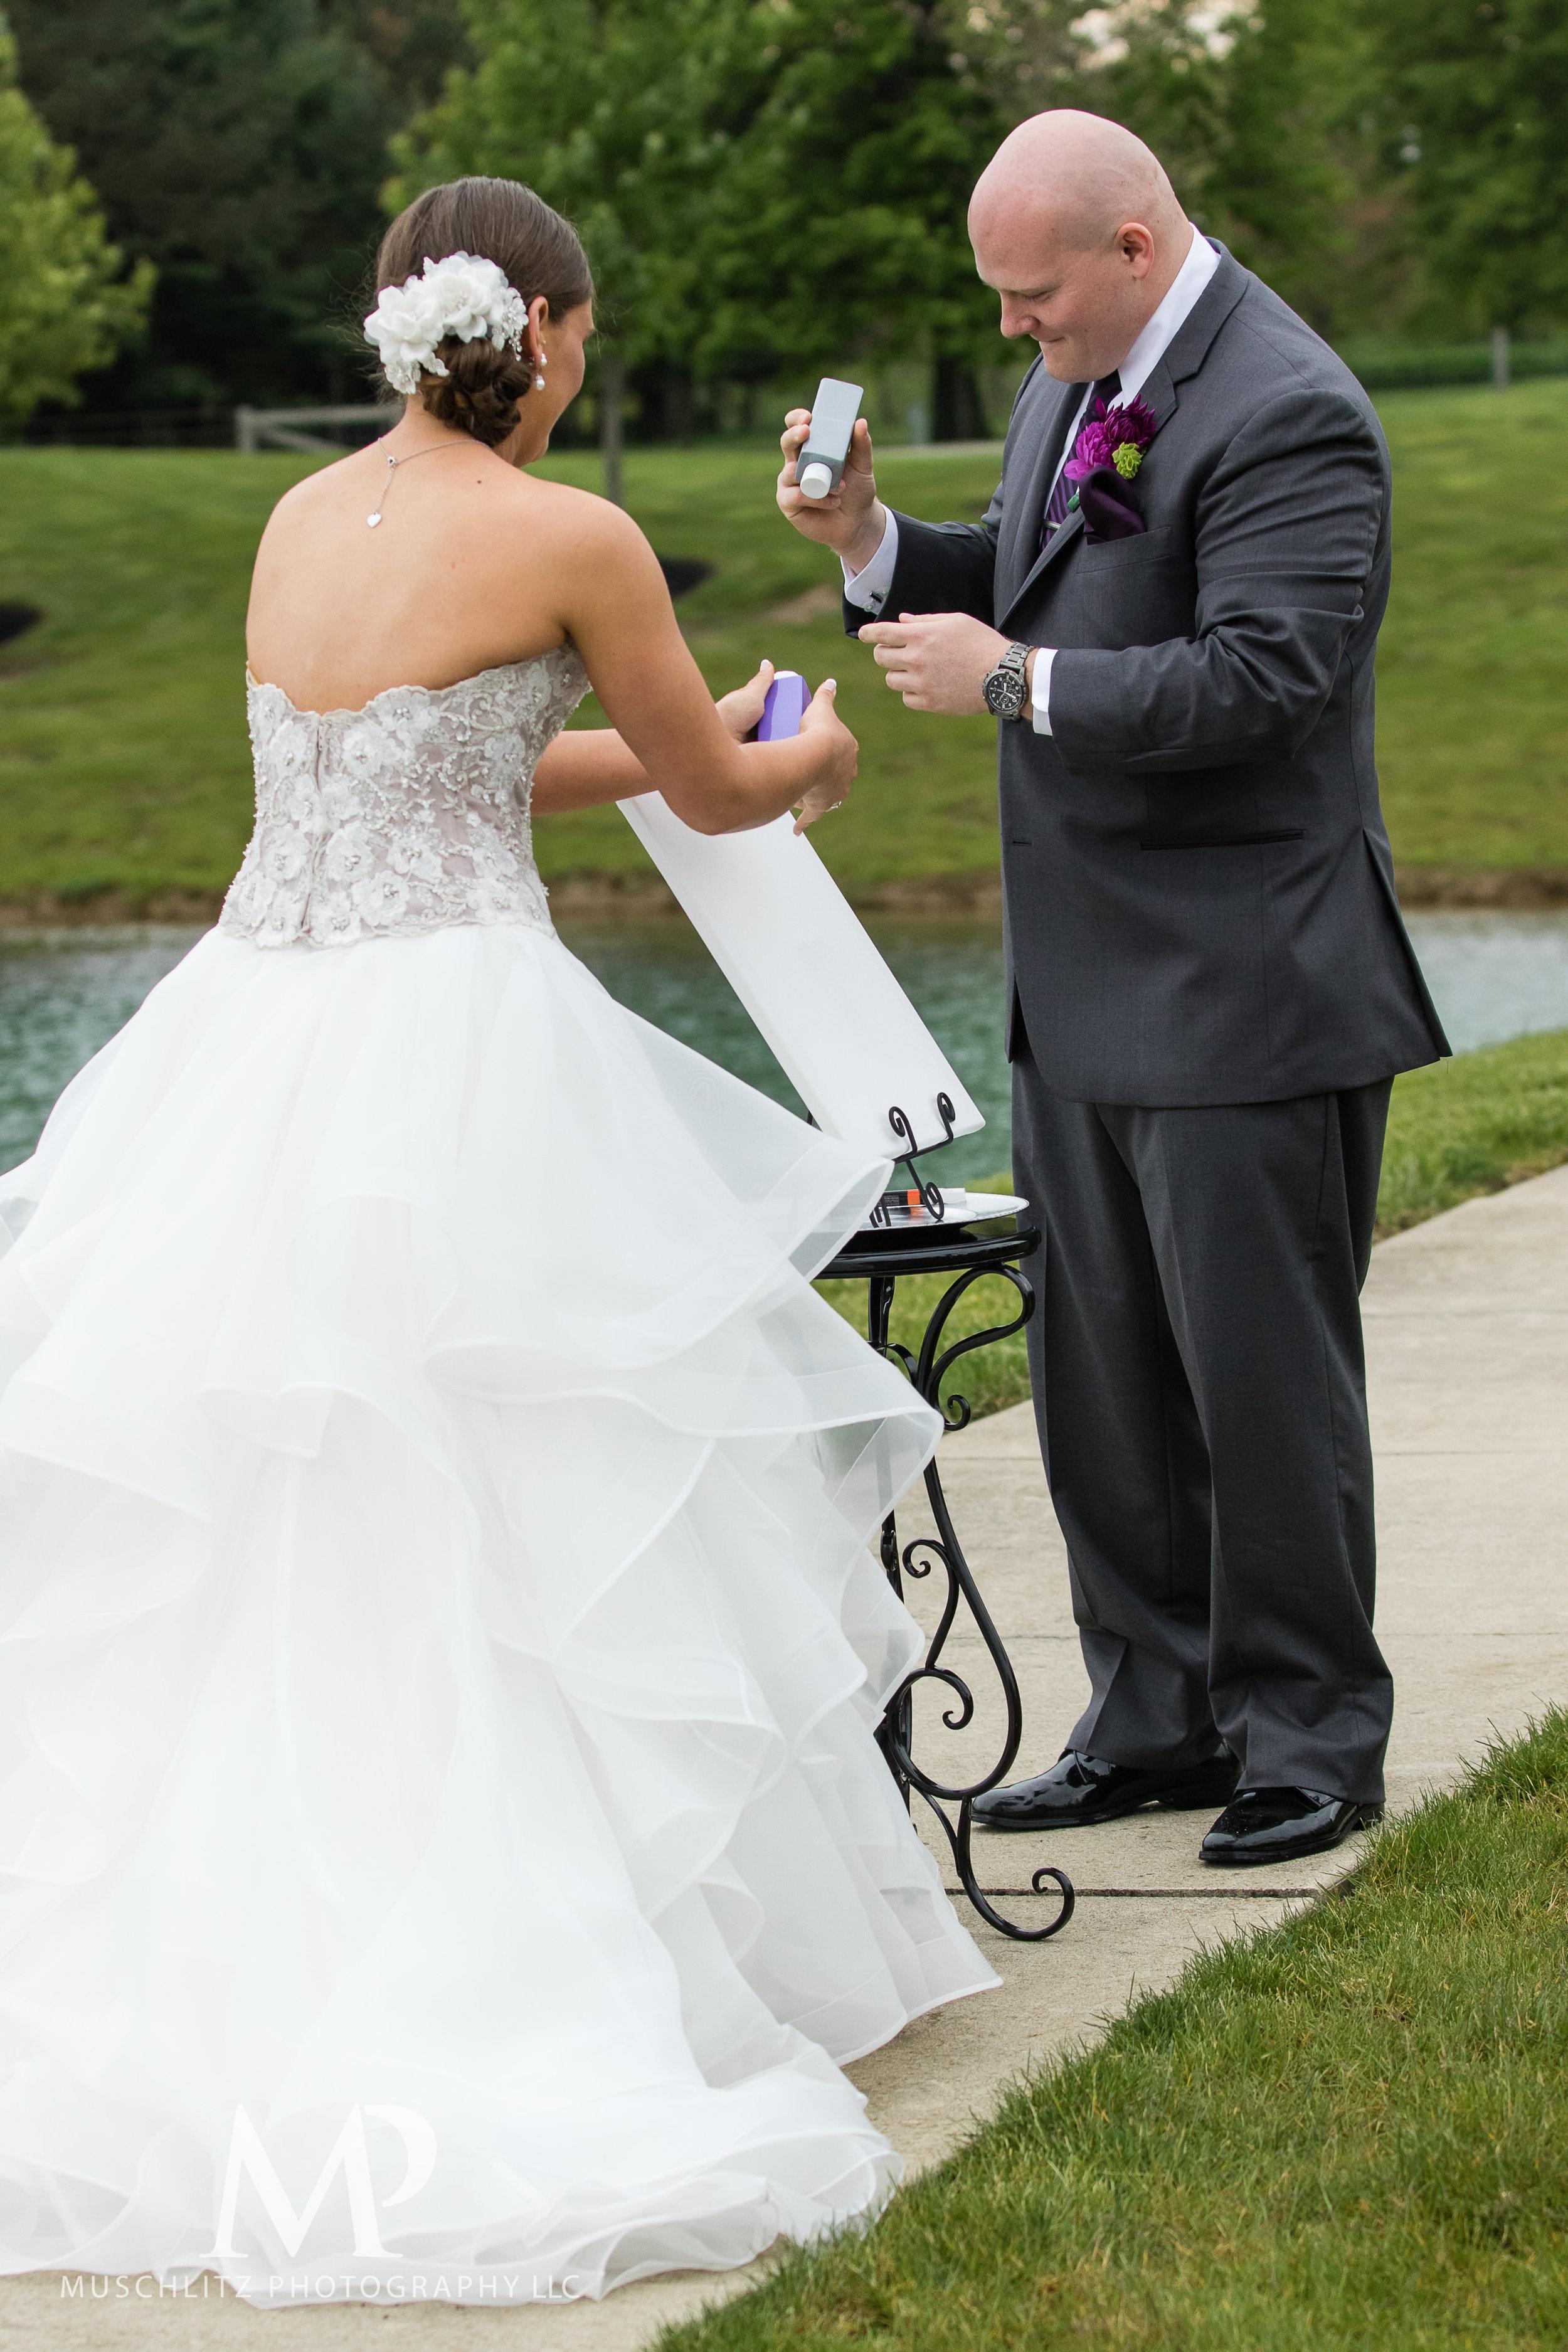 club-at-corazon-wedding-ceremony-reception-columbus-dublin-ohio-ohio-university-theme-035.JPG